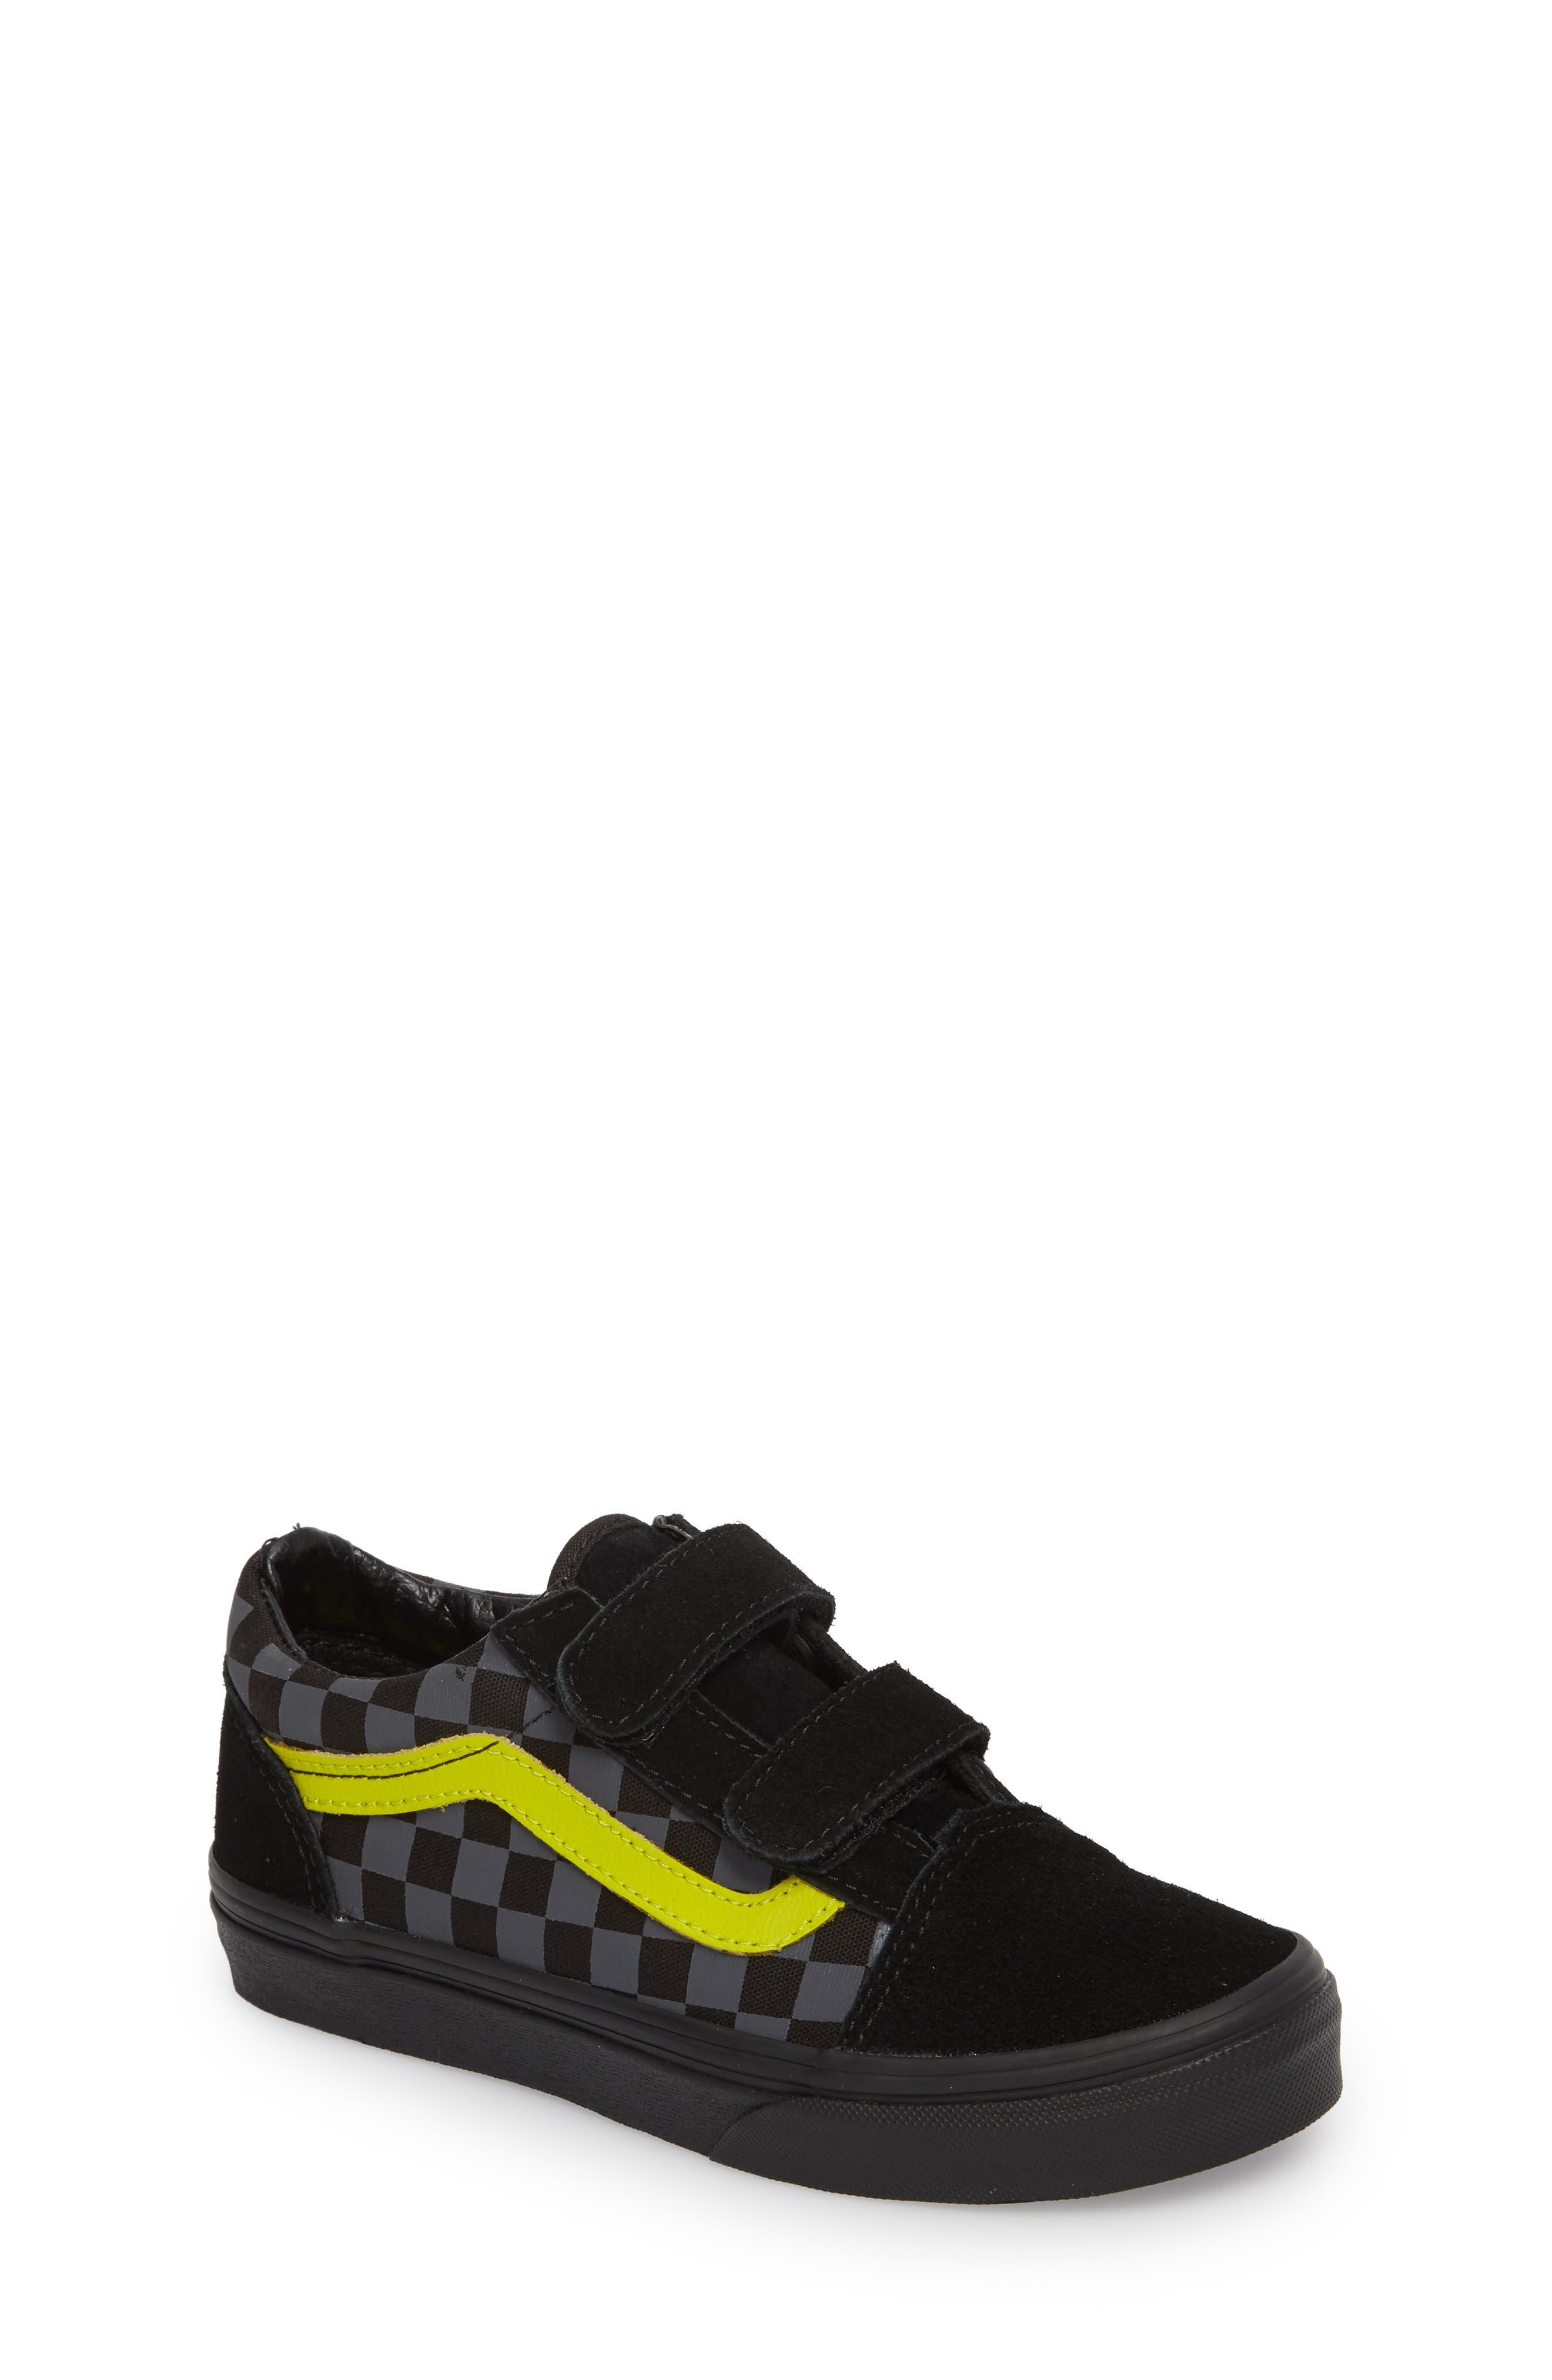 Alternate Image 1 Selected - Vans Reflective Checkerboard Old Skool V Sneaker (Baby, Walker, Toddler, Little Kid & Big Kid)